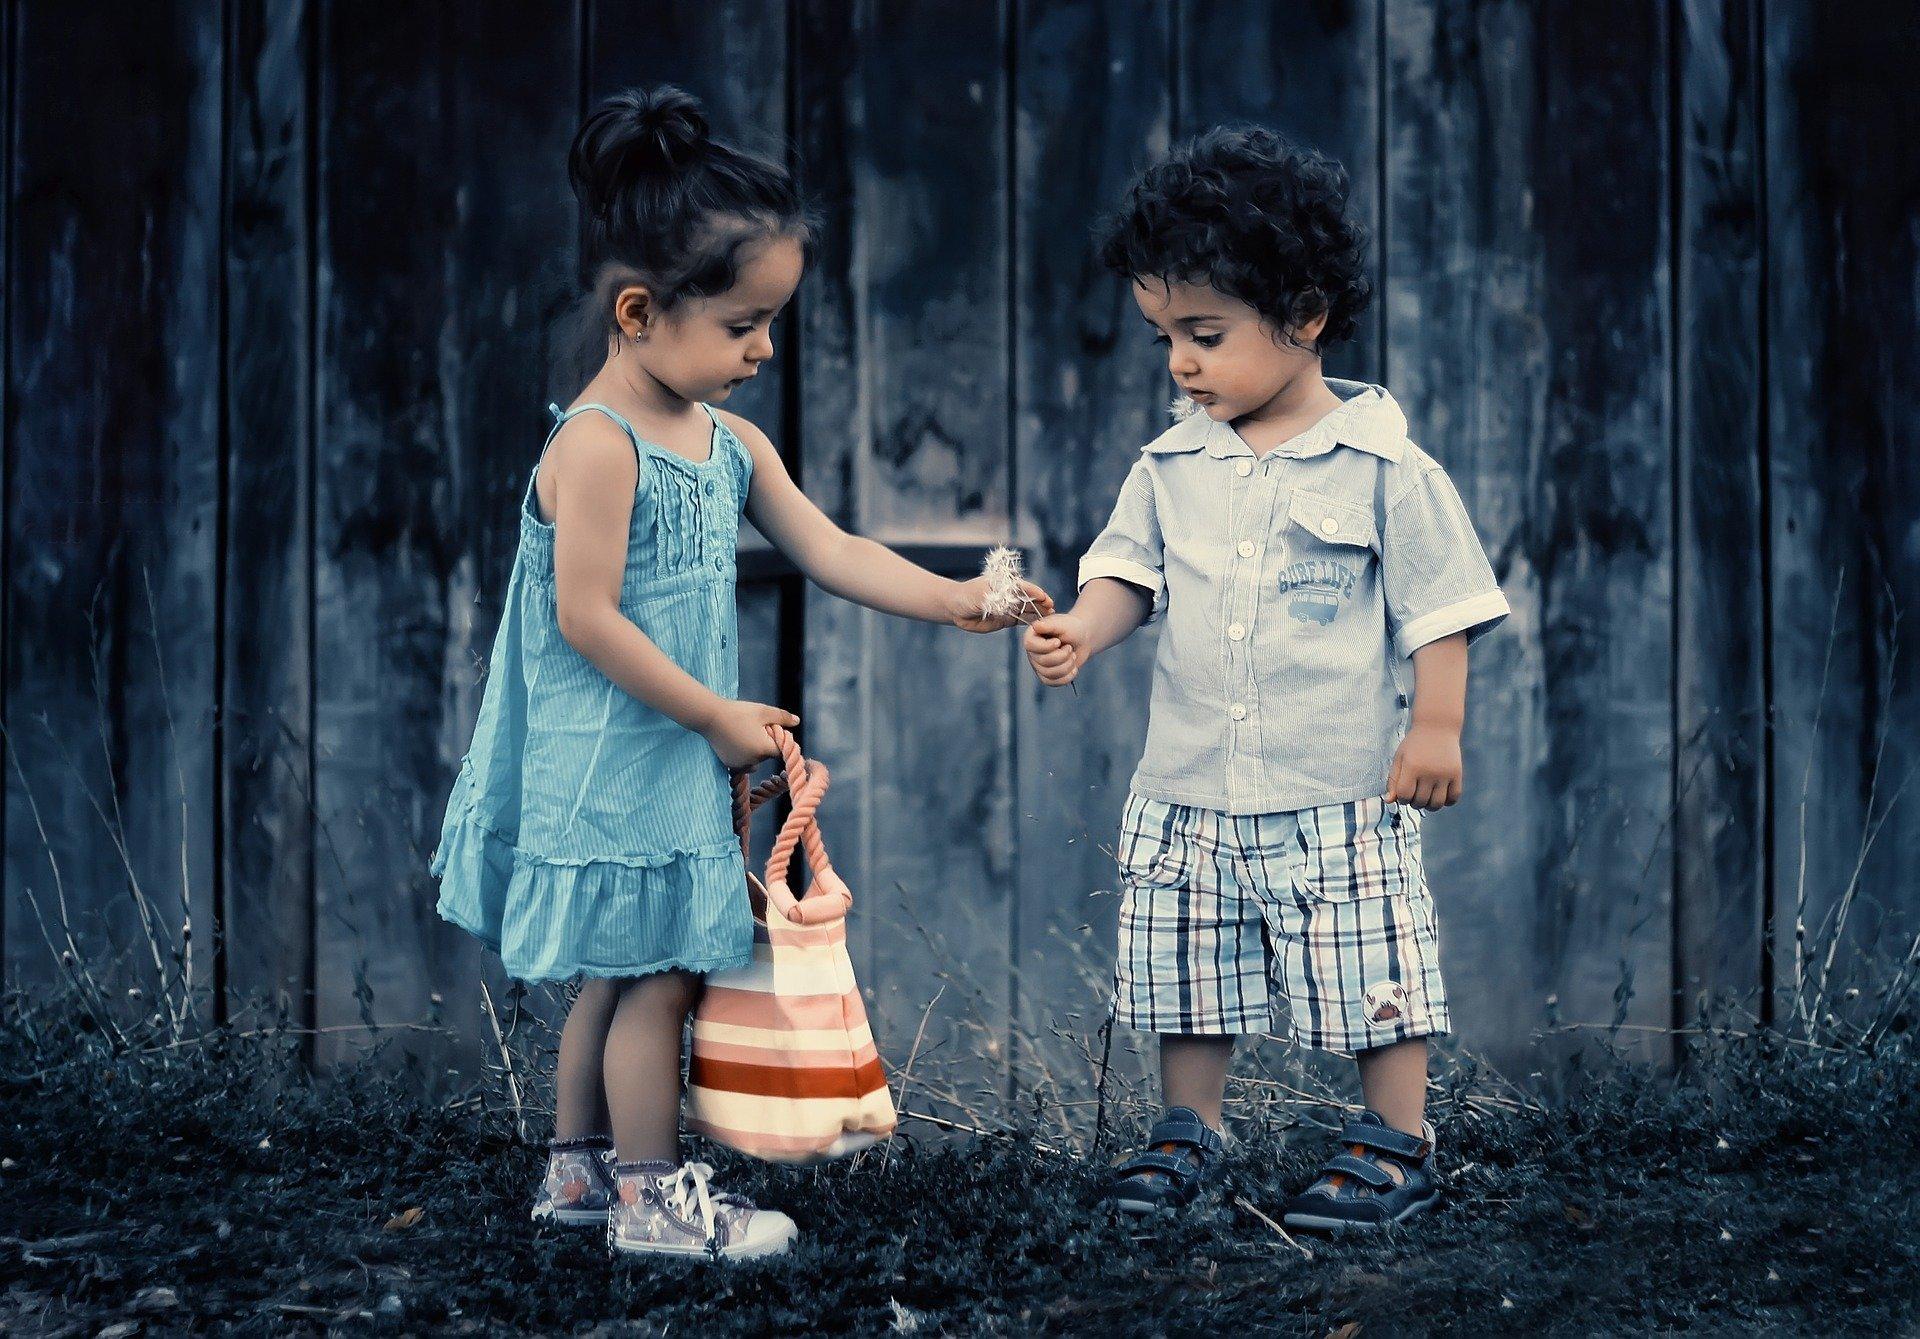 Kids prefer friends who talk like they do